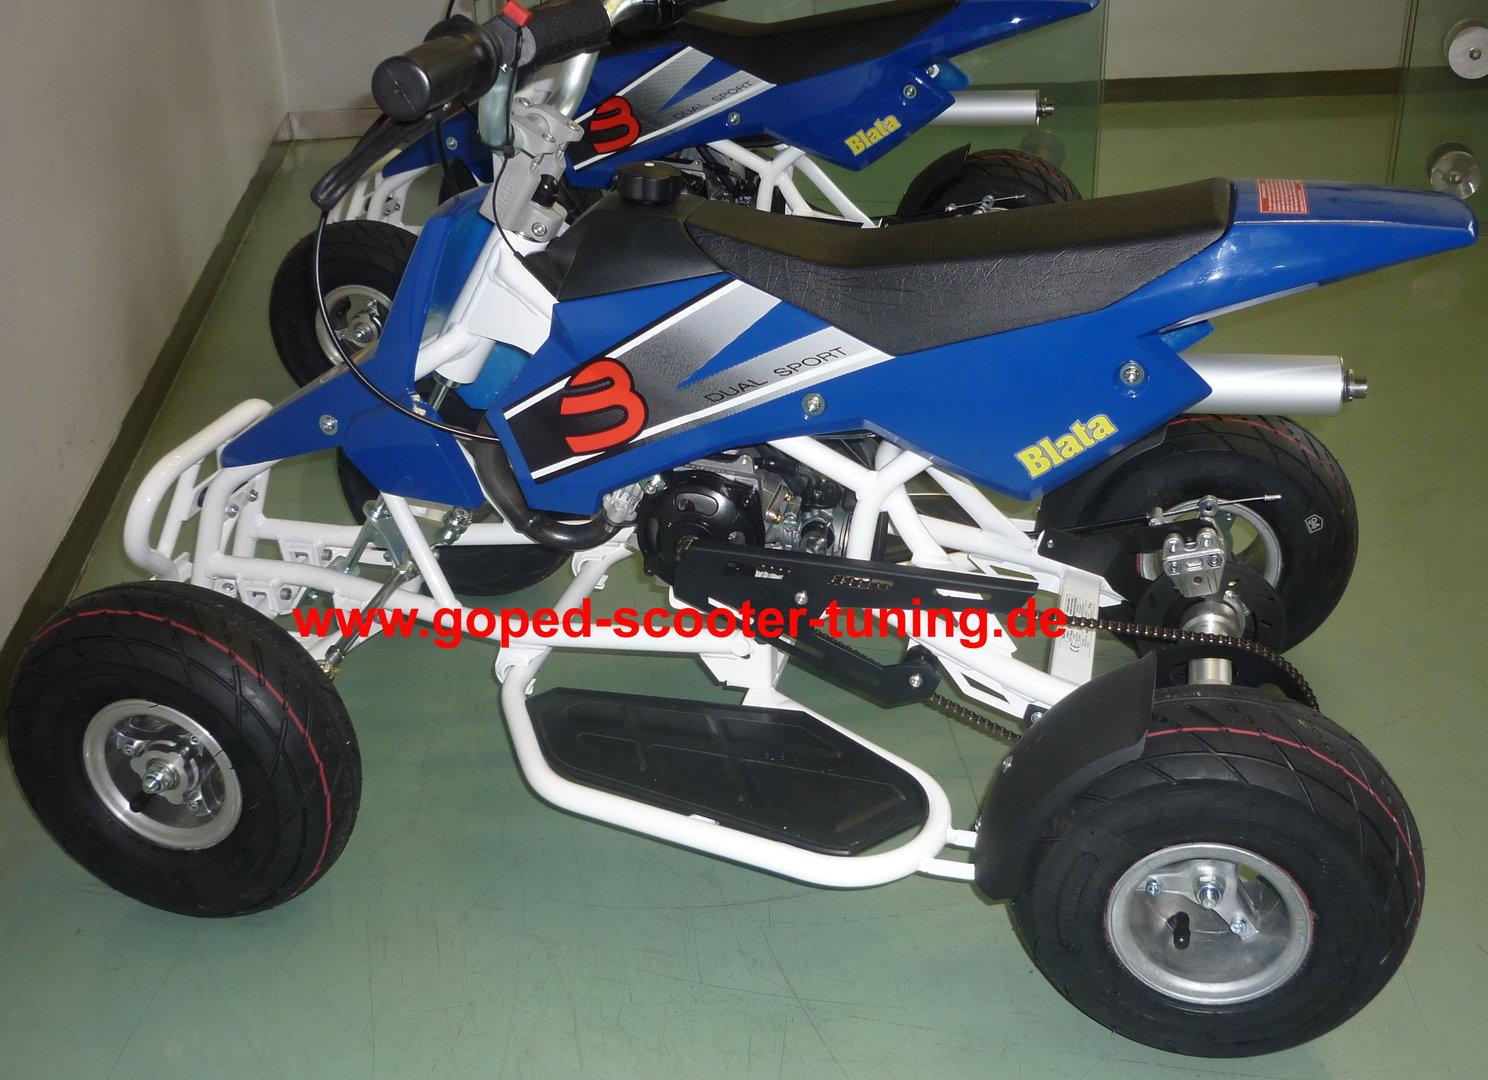 blata quad midiquadard miniquad goped scooter tuning